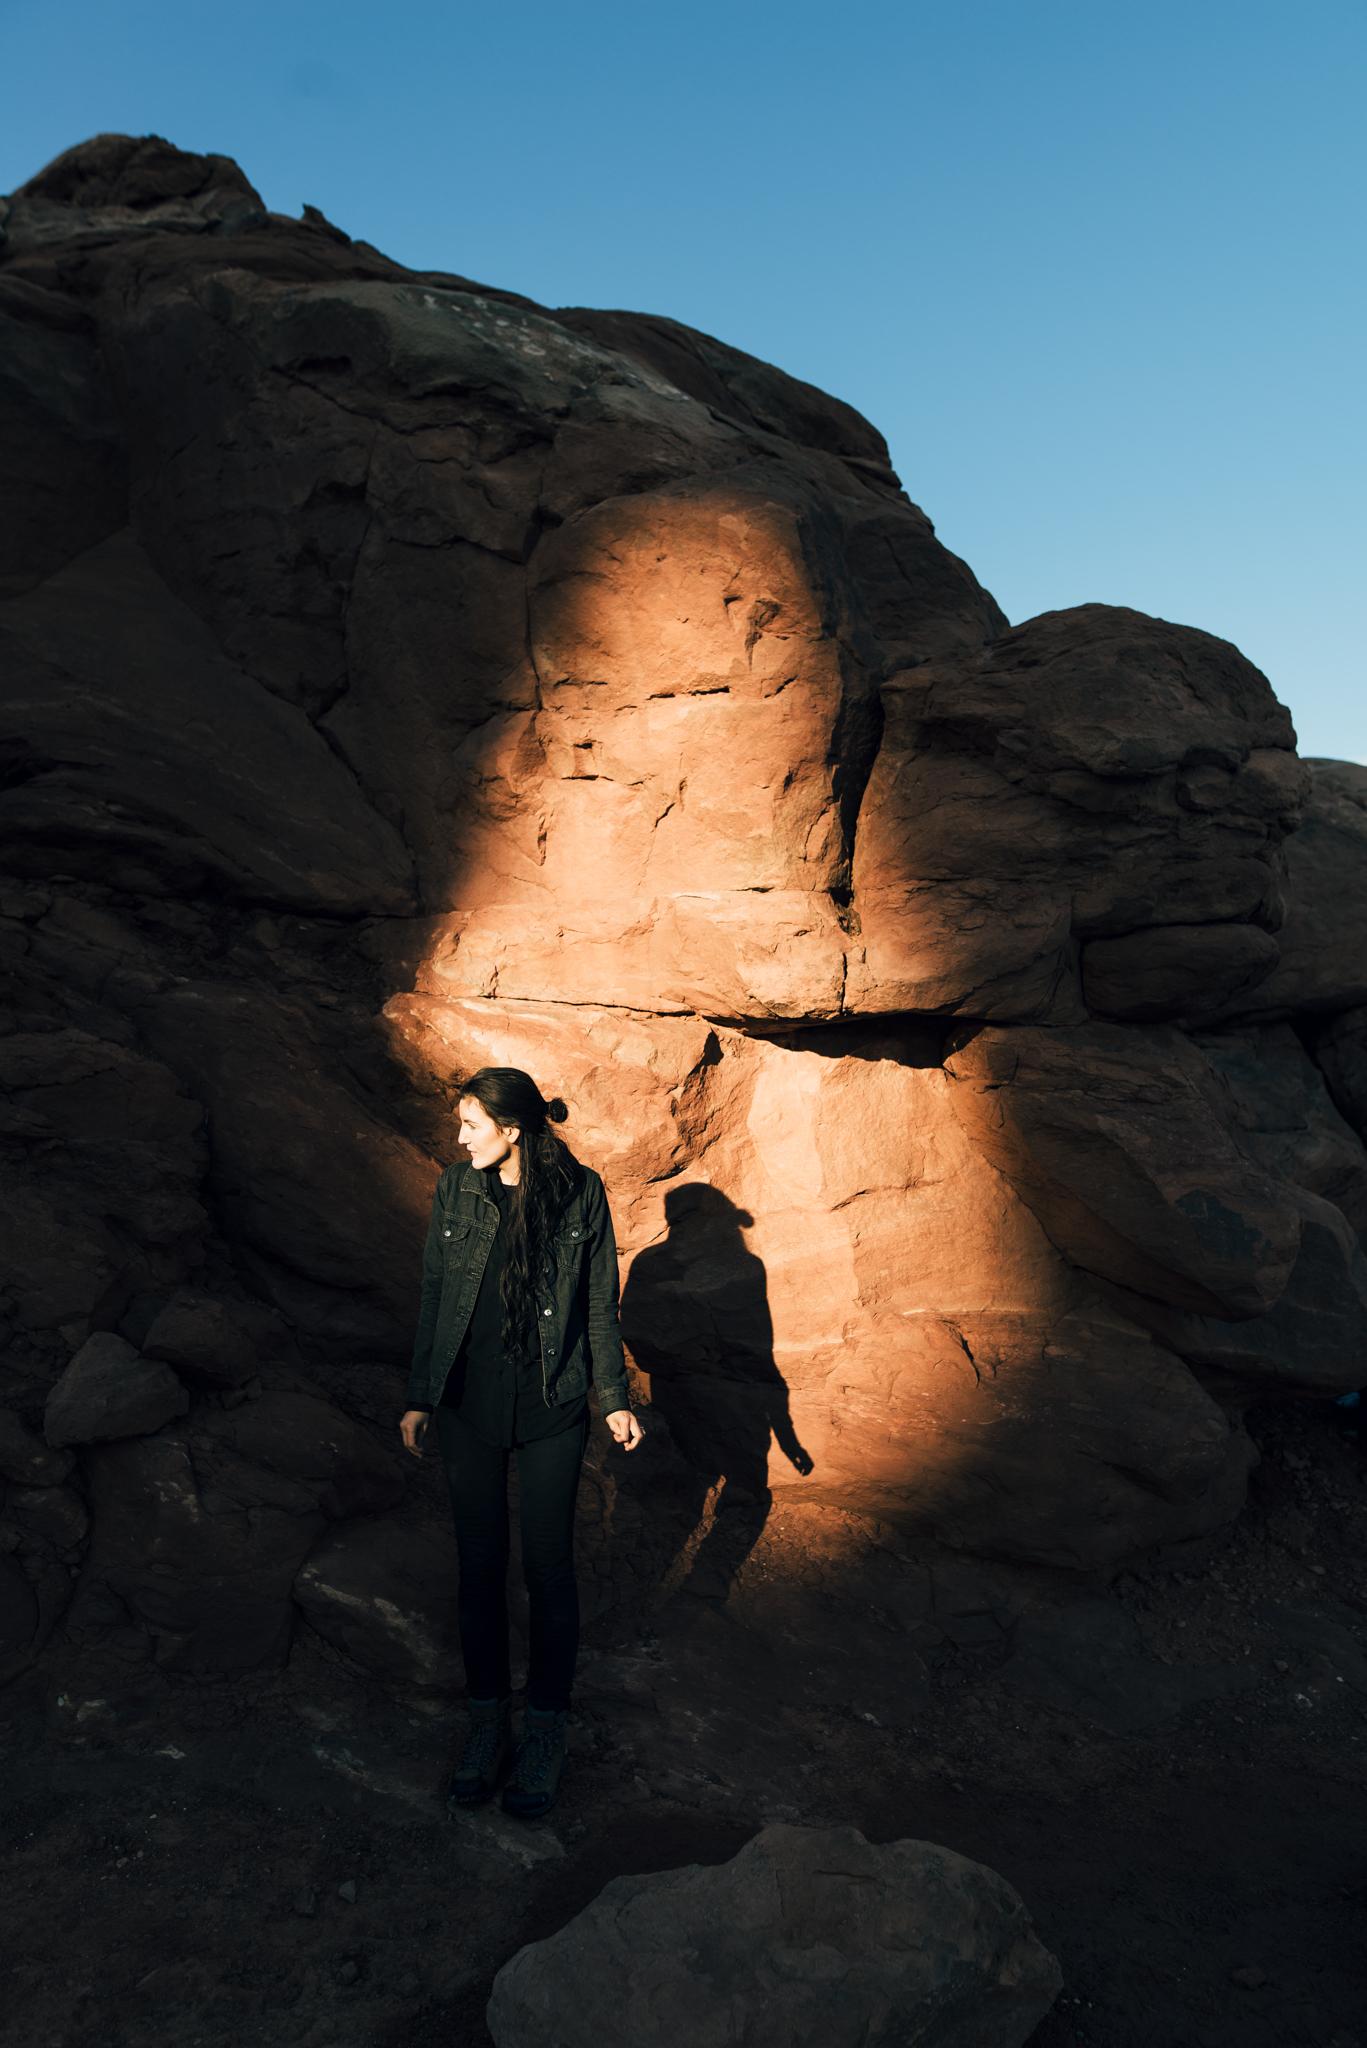 Isaiah-&-Taylor-Photography---White-Sand-Dunes-13.jpg